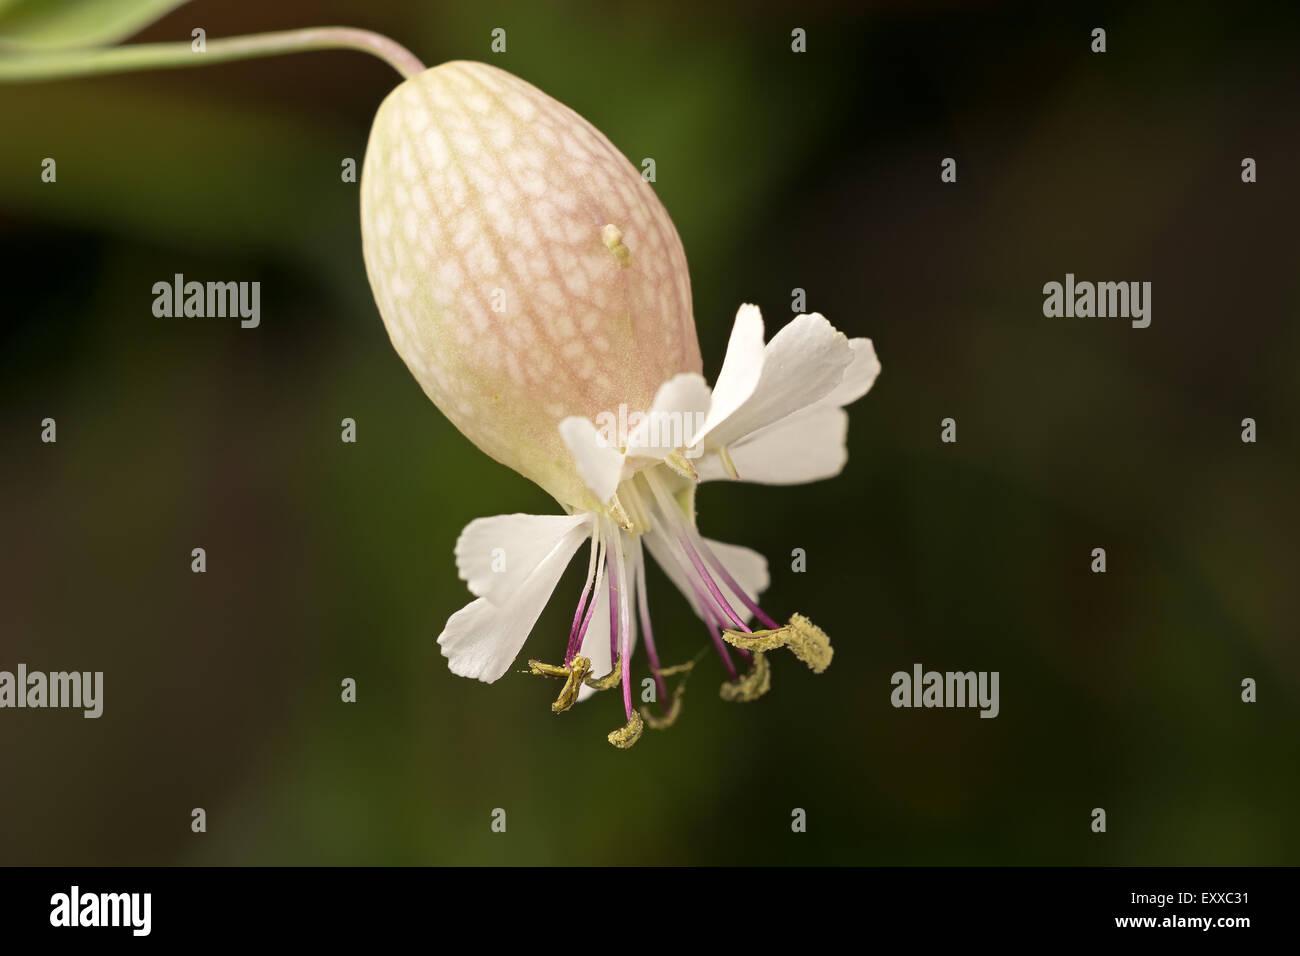 Wild white flower close-up on dark blurred background. - Stock Image